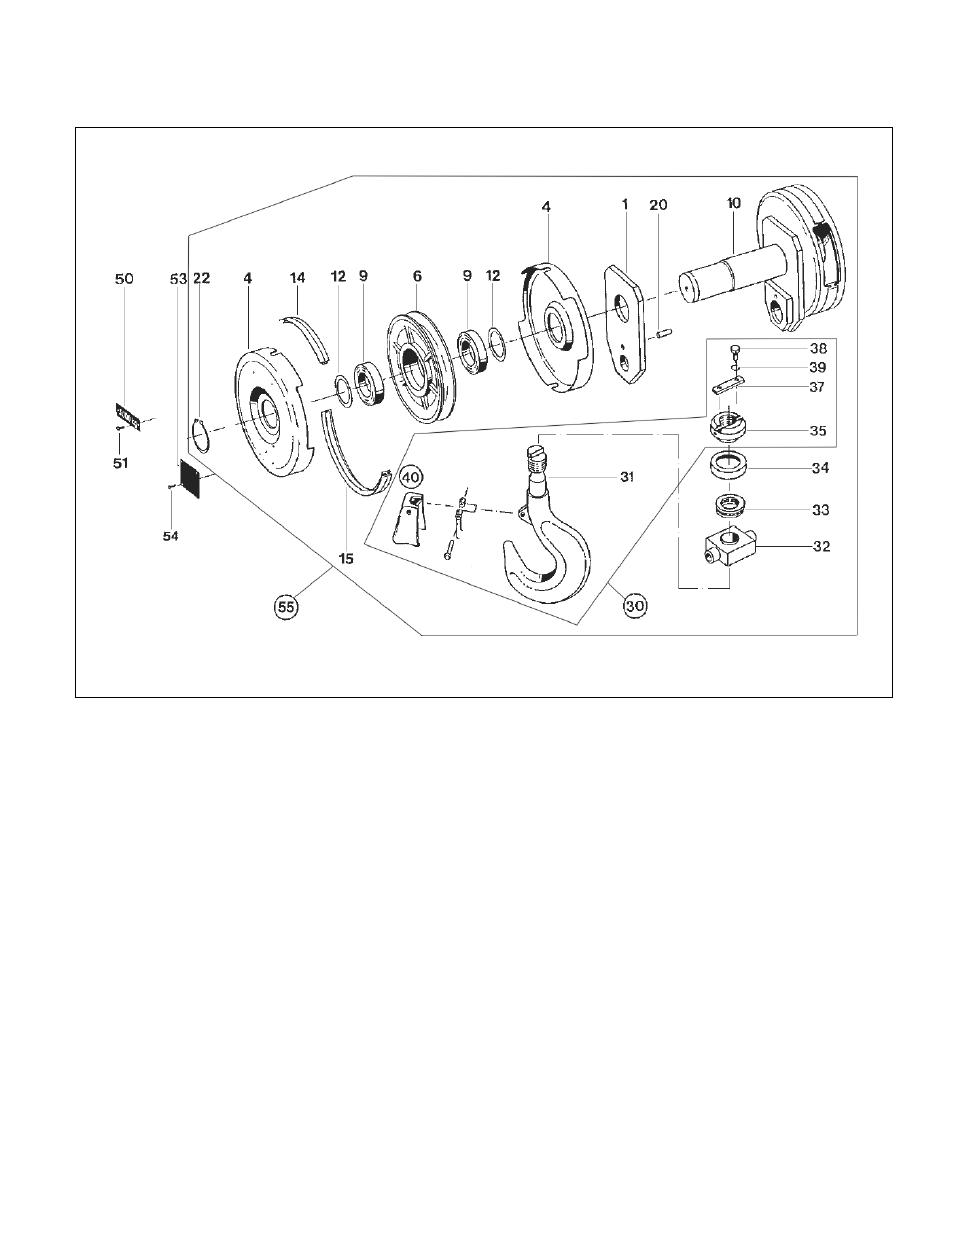 hight resolution of harrington hoists and cranes rhn rhino wire rope hoist user manual page 91 112